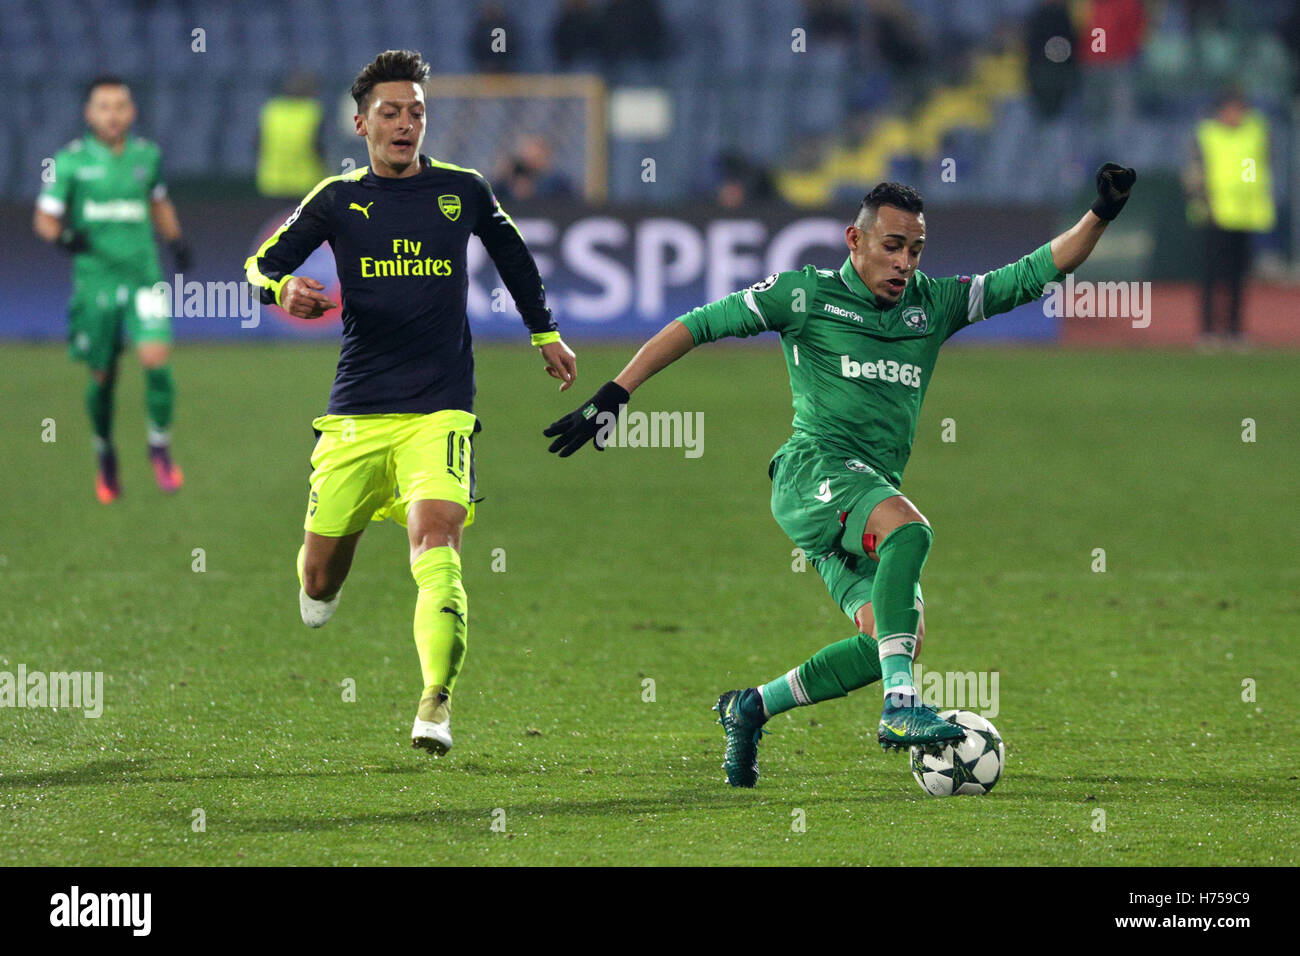 Sofia, Bulgaria - November 1, 2016: Arsenal's Mesut Ozil challenges Palomino Natanael during UEFA Champions League - Stock Image